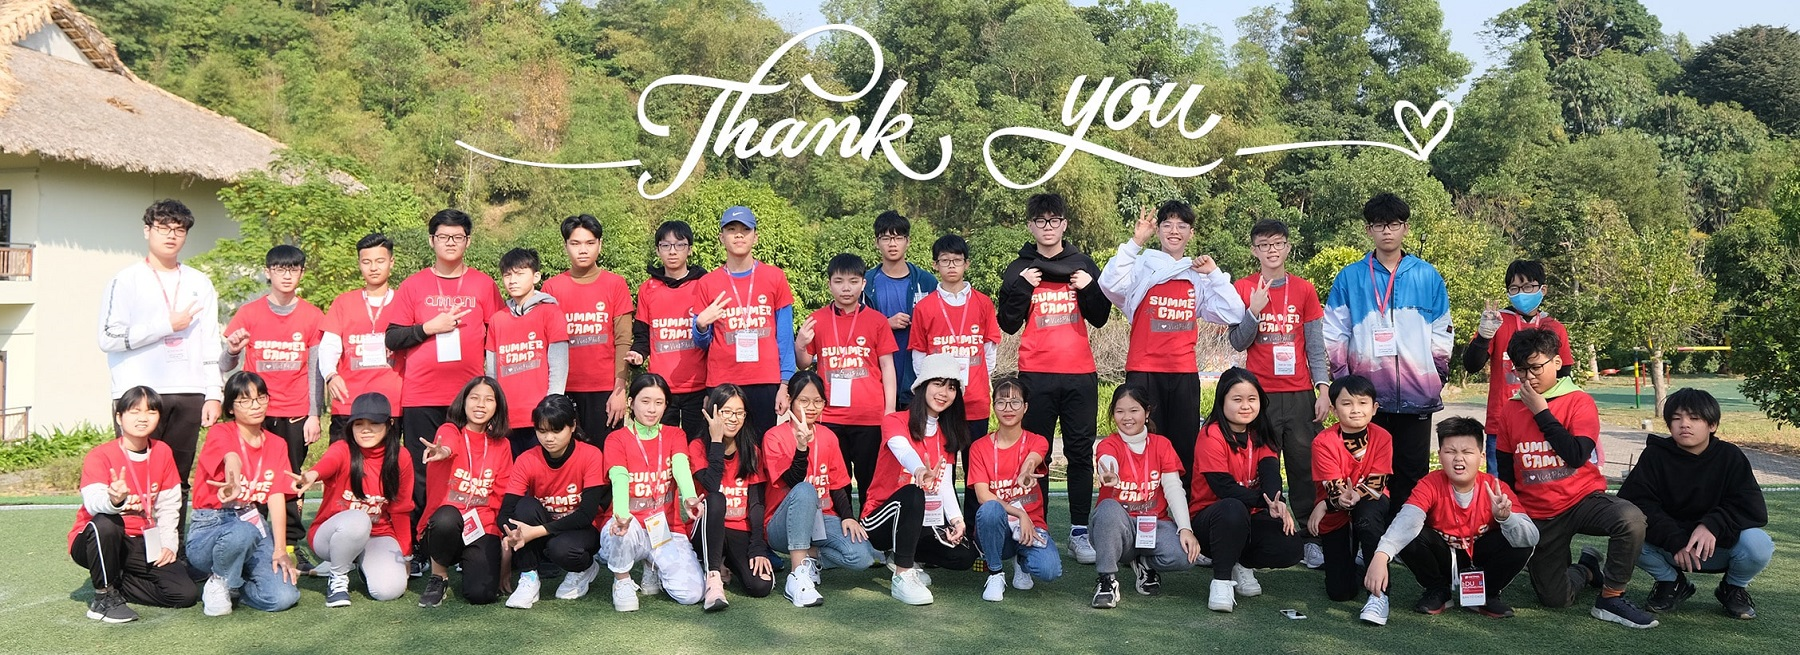 VietPhil-Camp-VSLC-2020-thank-you-Web